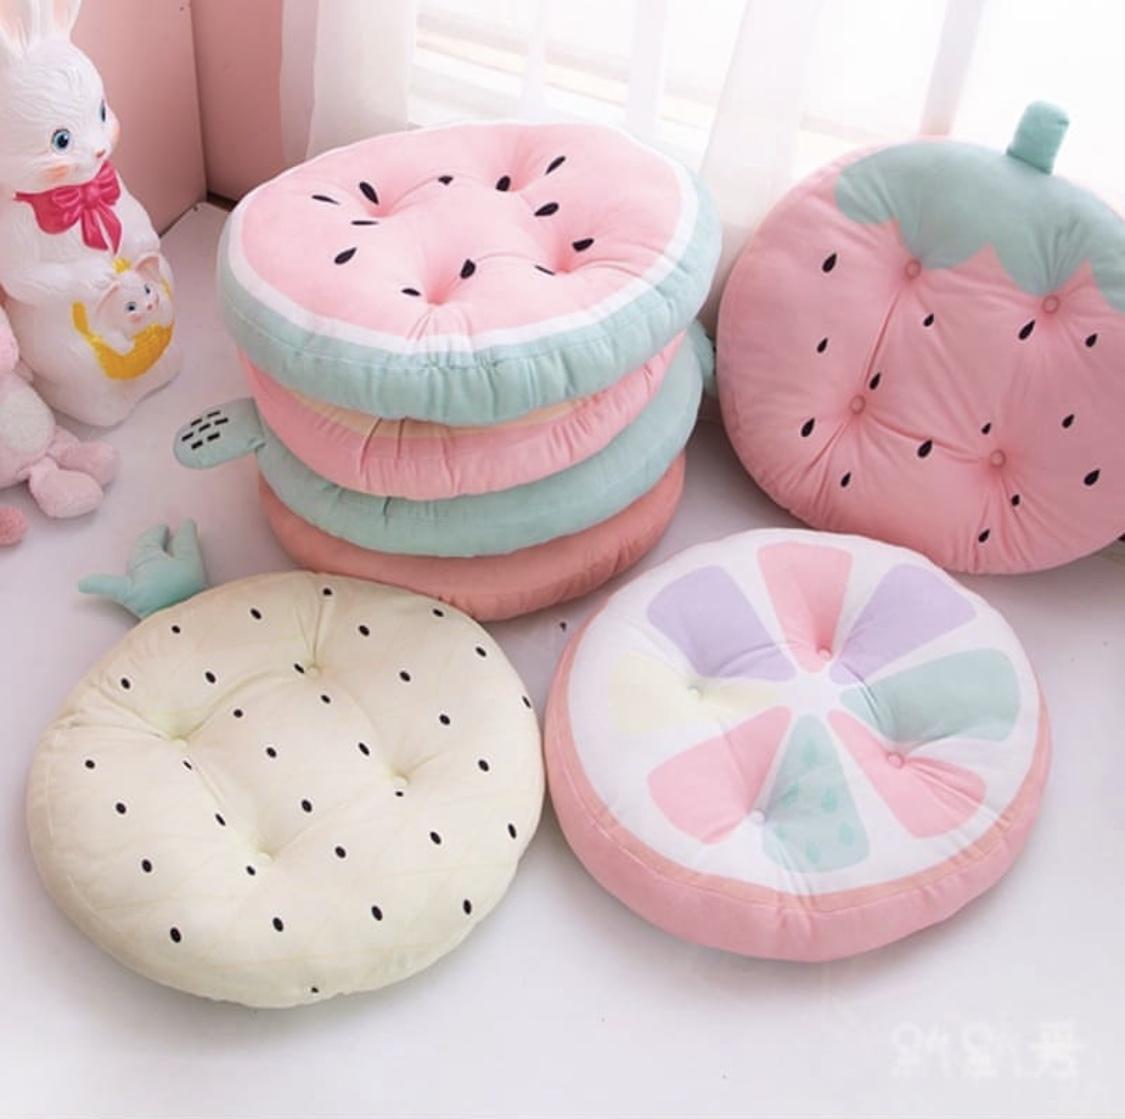 Kawaii Fruit Cushion Pillow (45cm) – Limited Edition